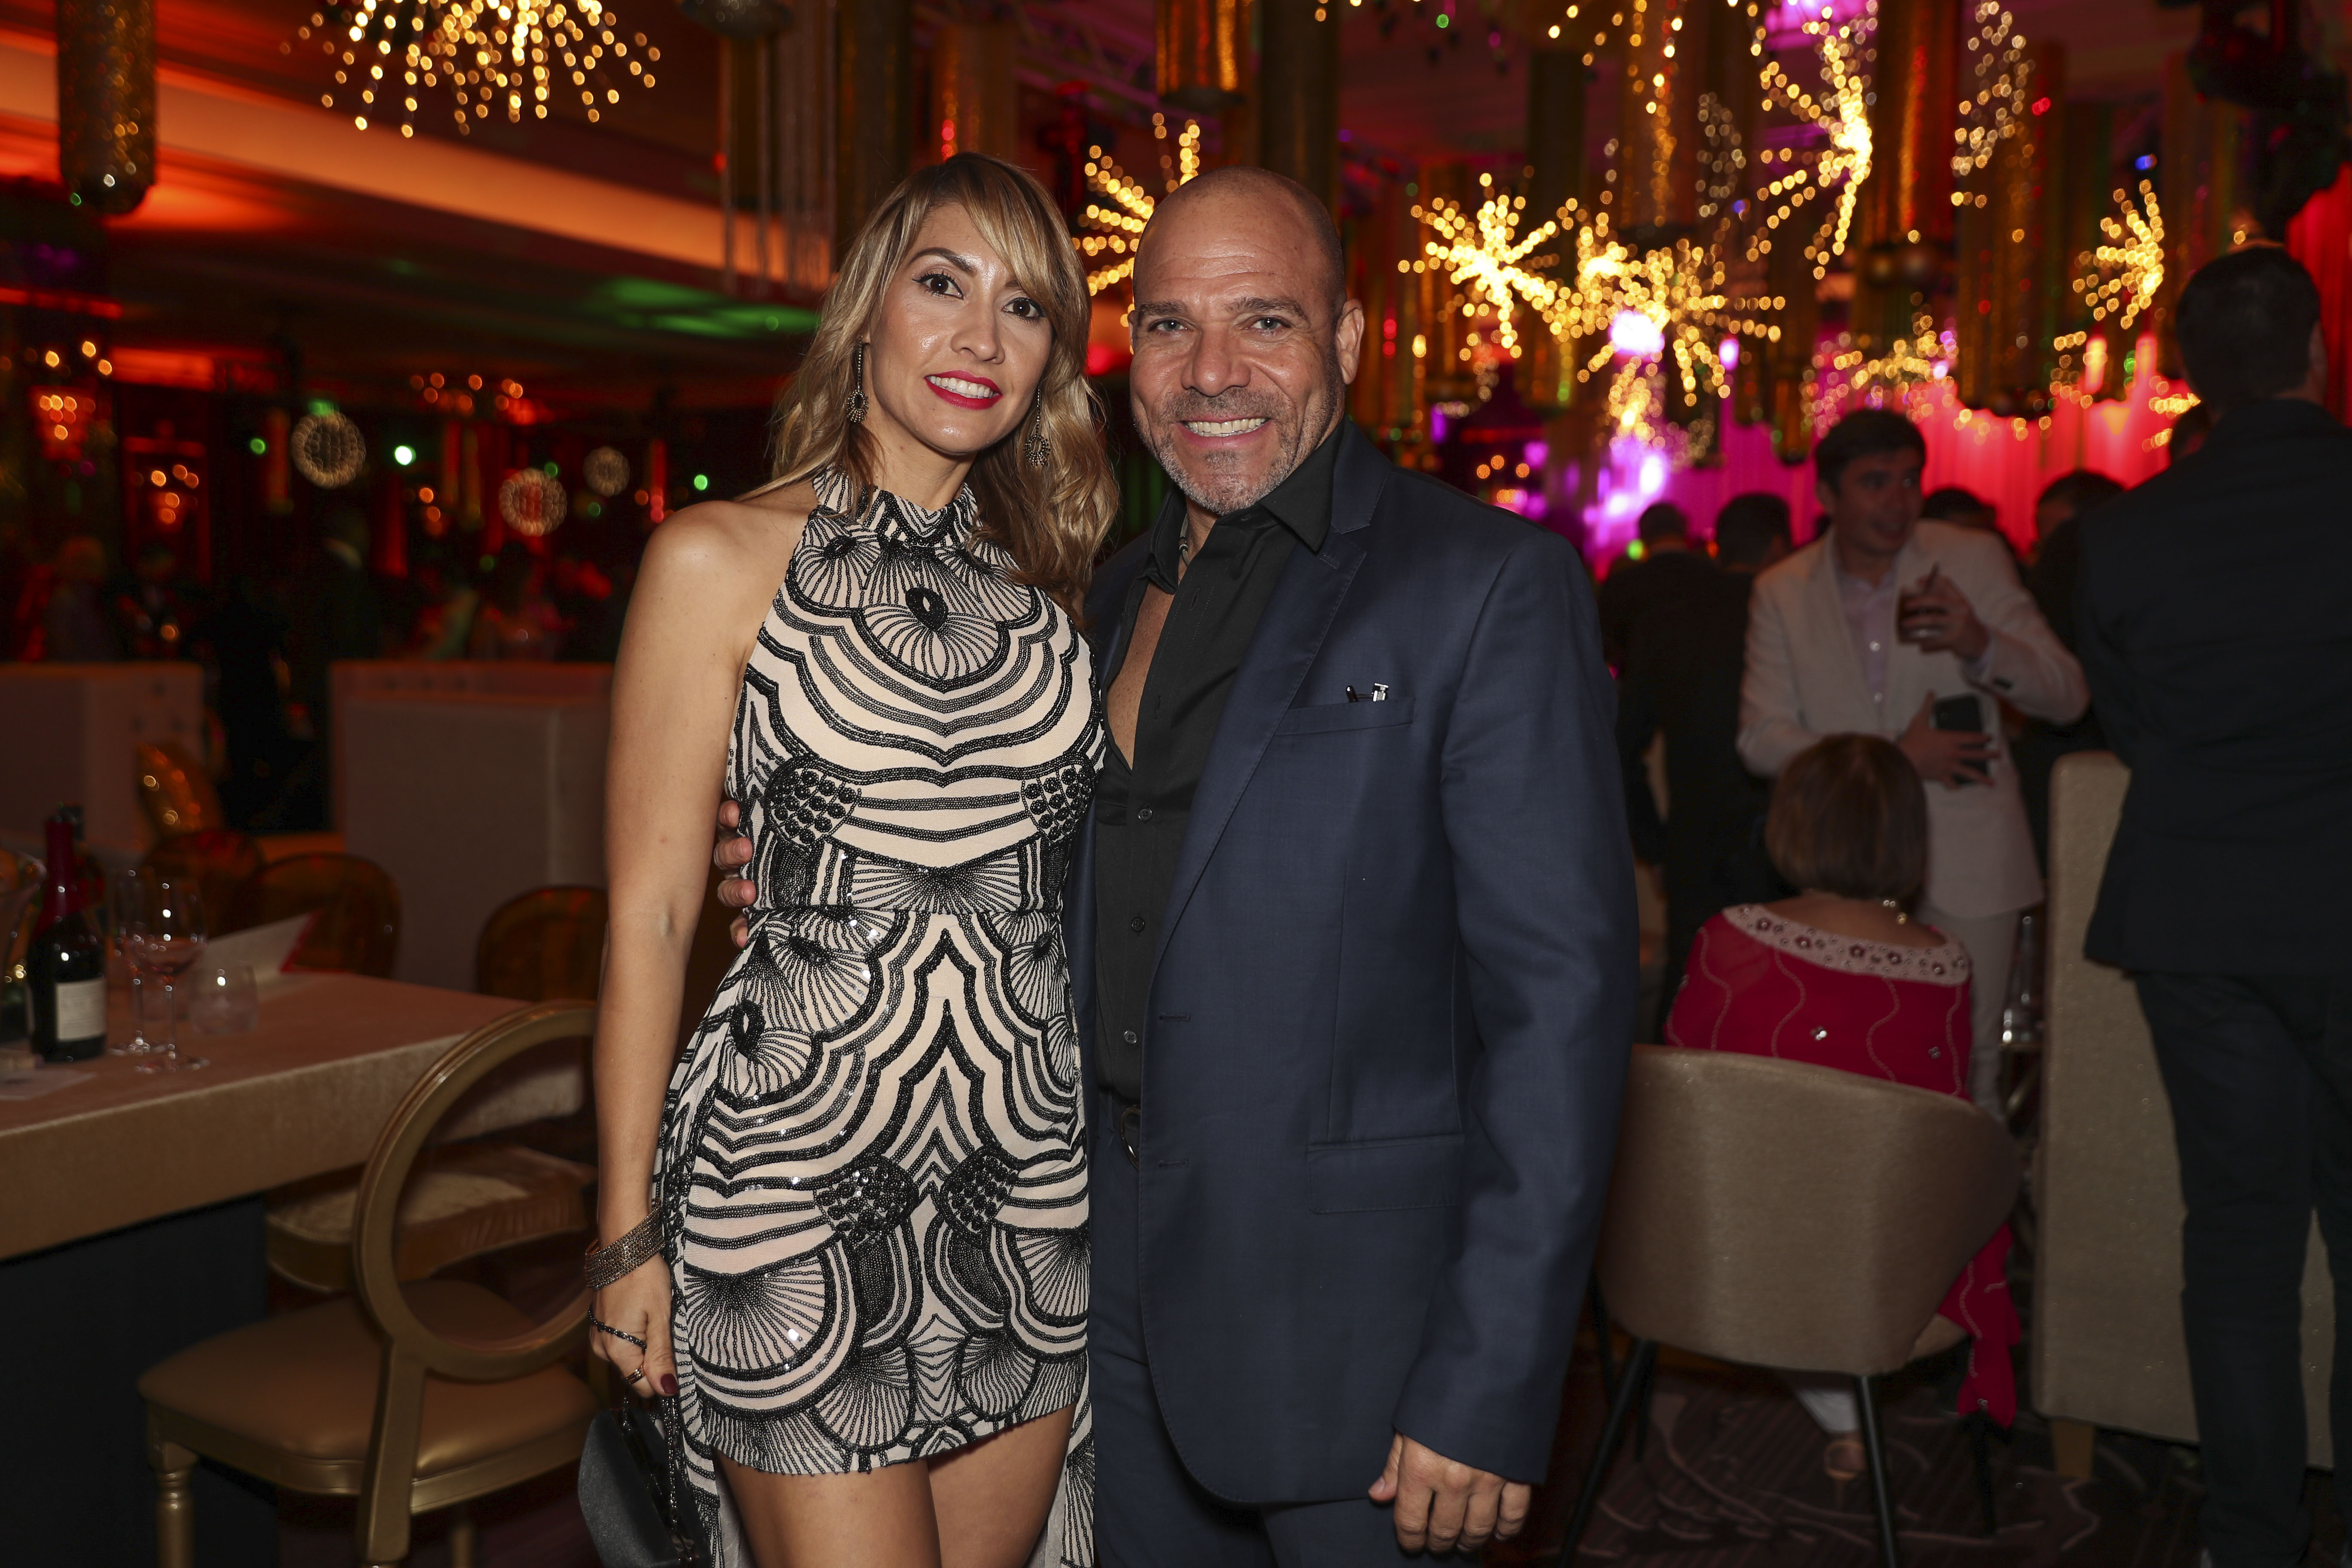 Arlyn Pérez y Joche Santiago. (Suministrada)